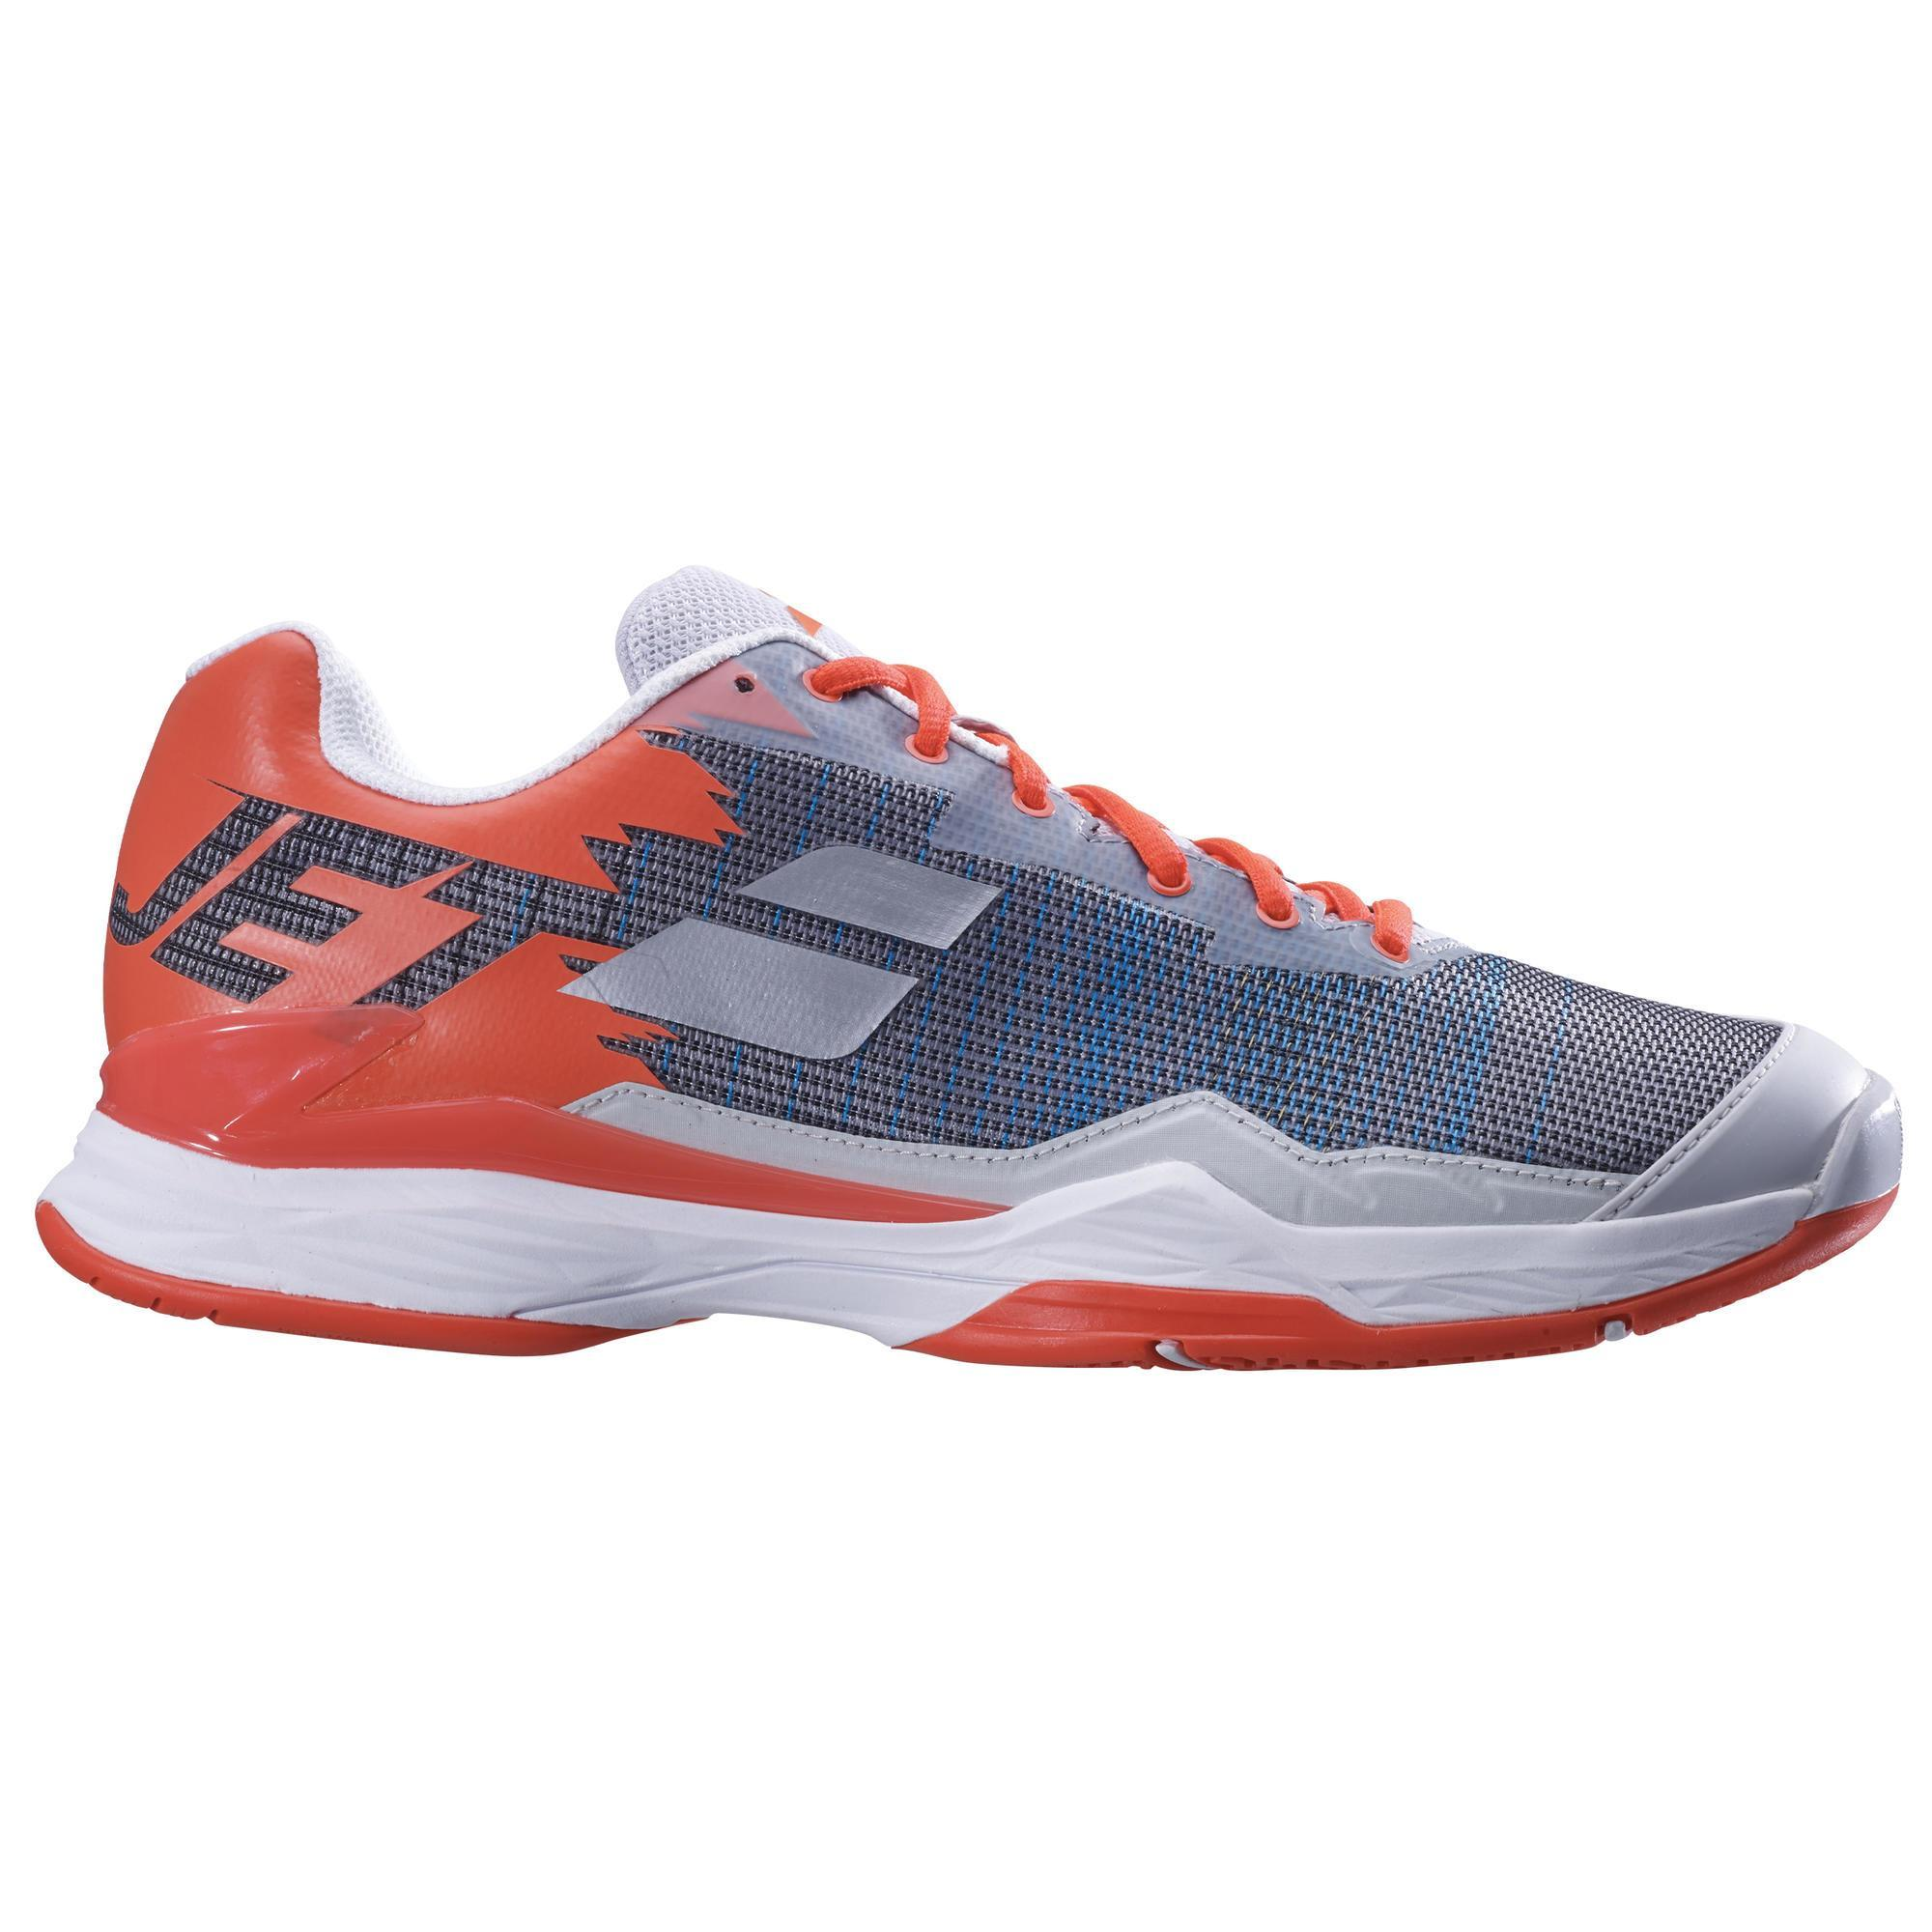 Tennisschuhe Jet Mach 1 Herren Multicourt grau/orange